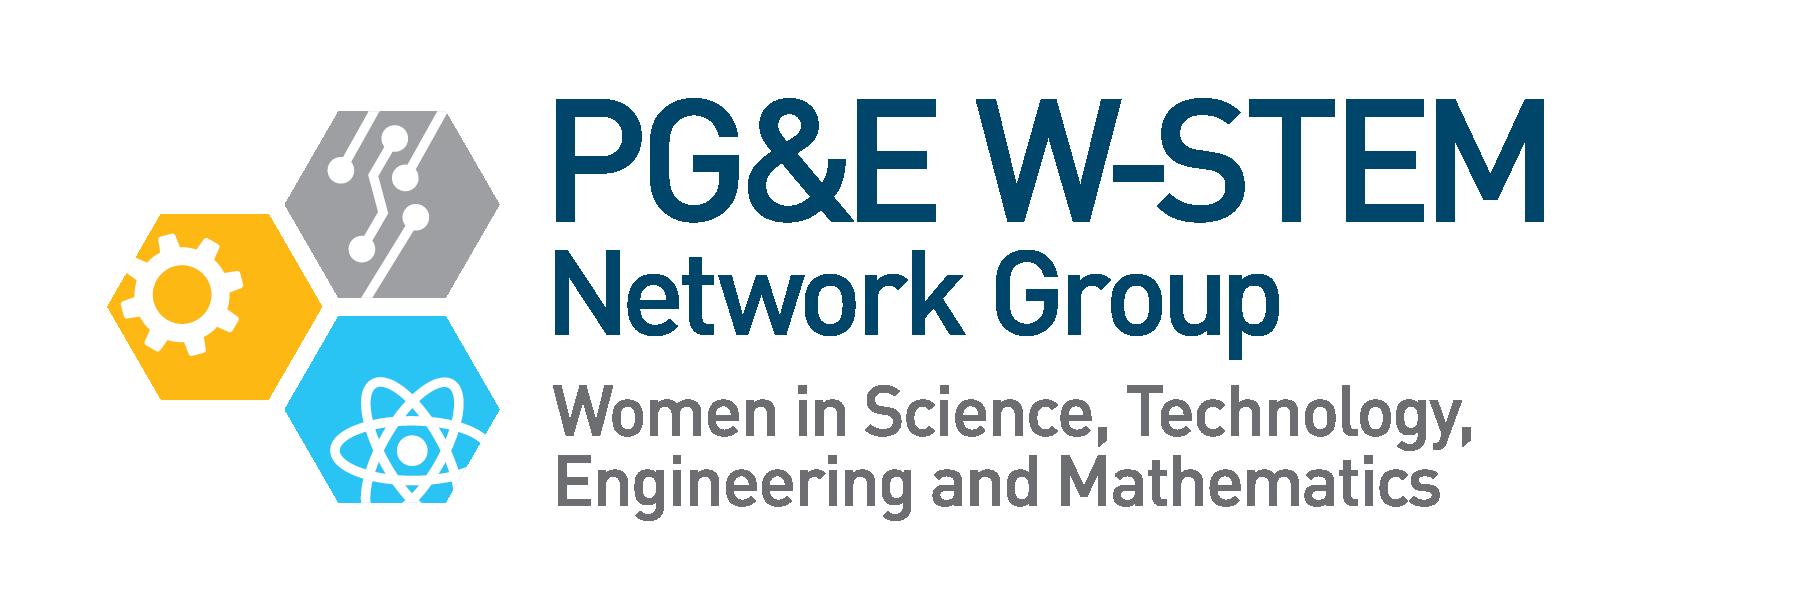 PG&E Womens Network